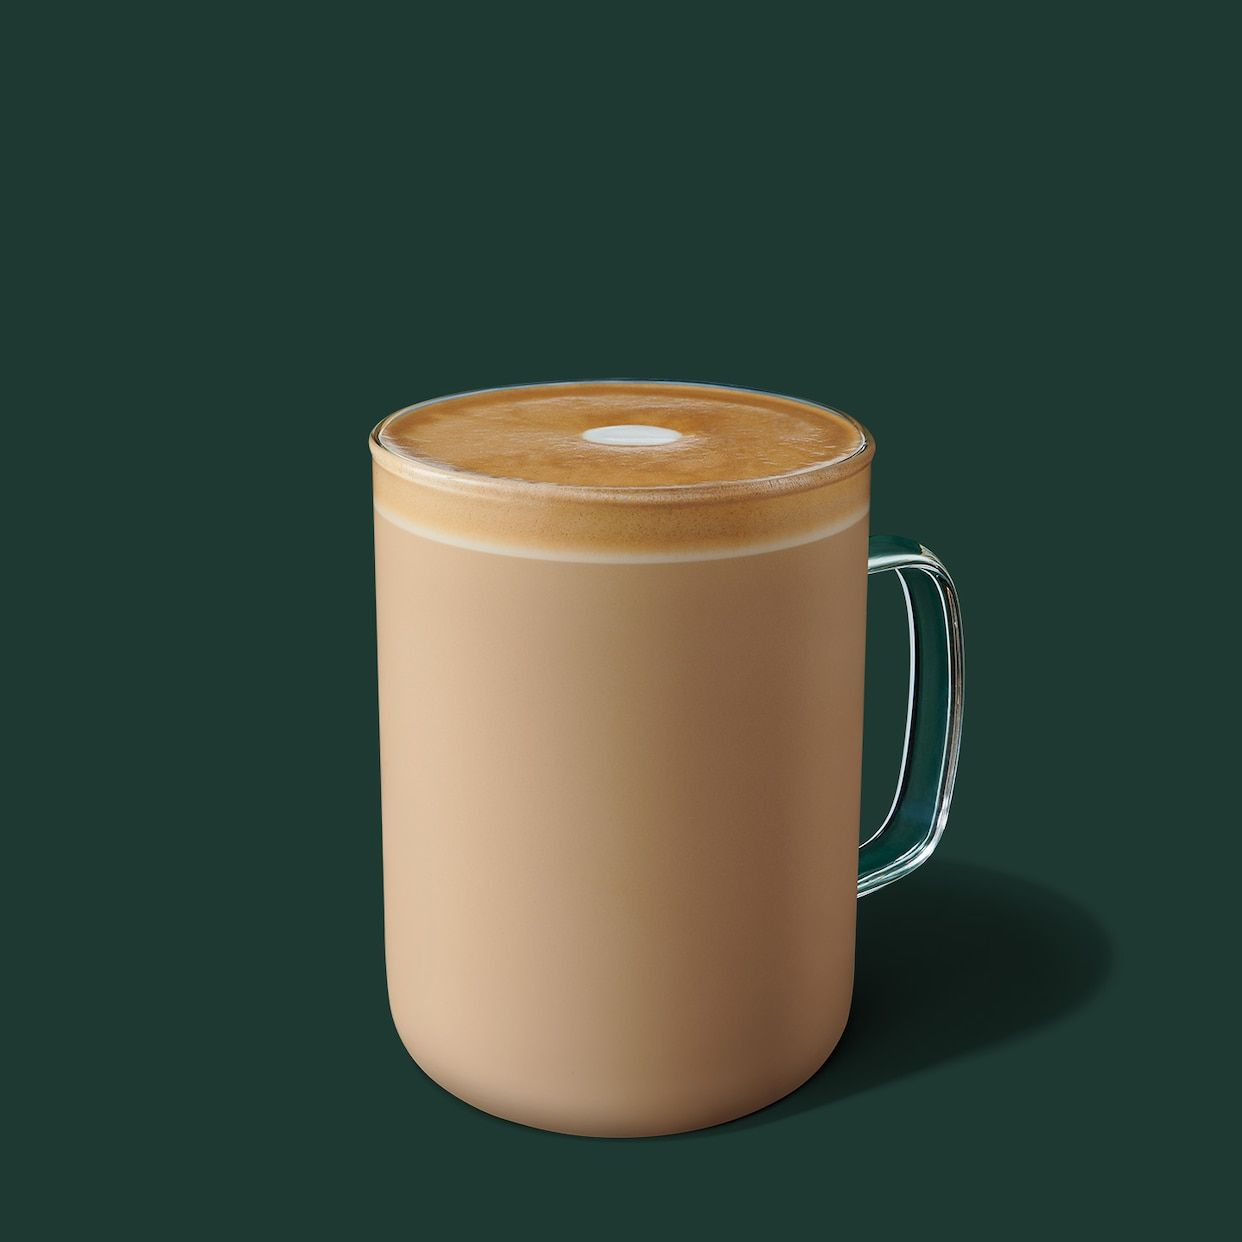 -Flat White Coffee Starbucks Nutrition in 2020 | Vanilla ...